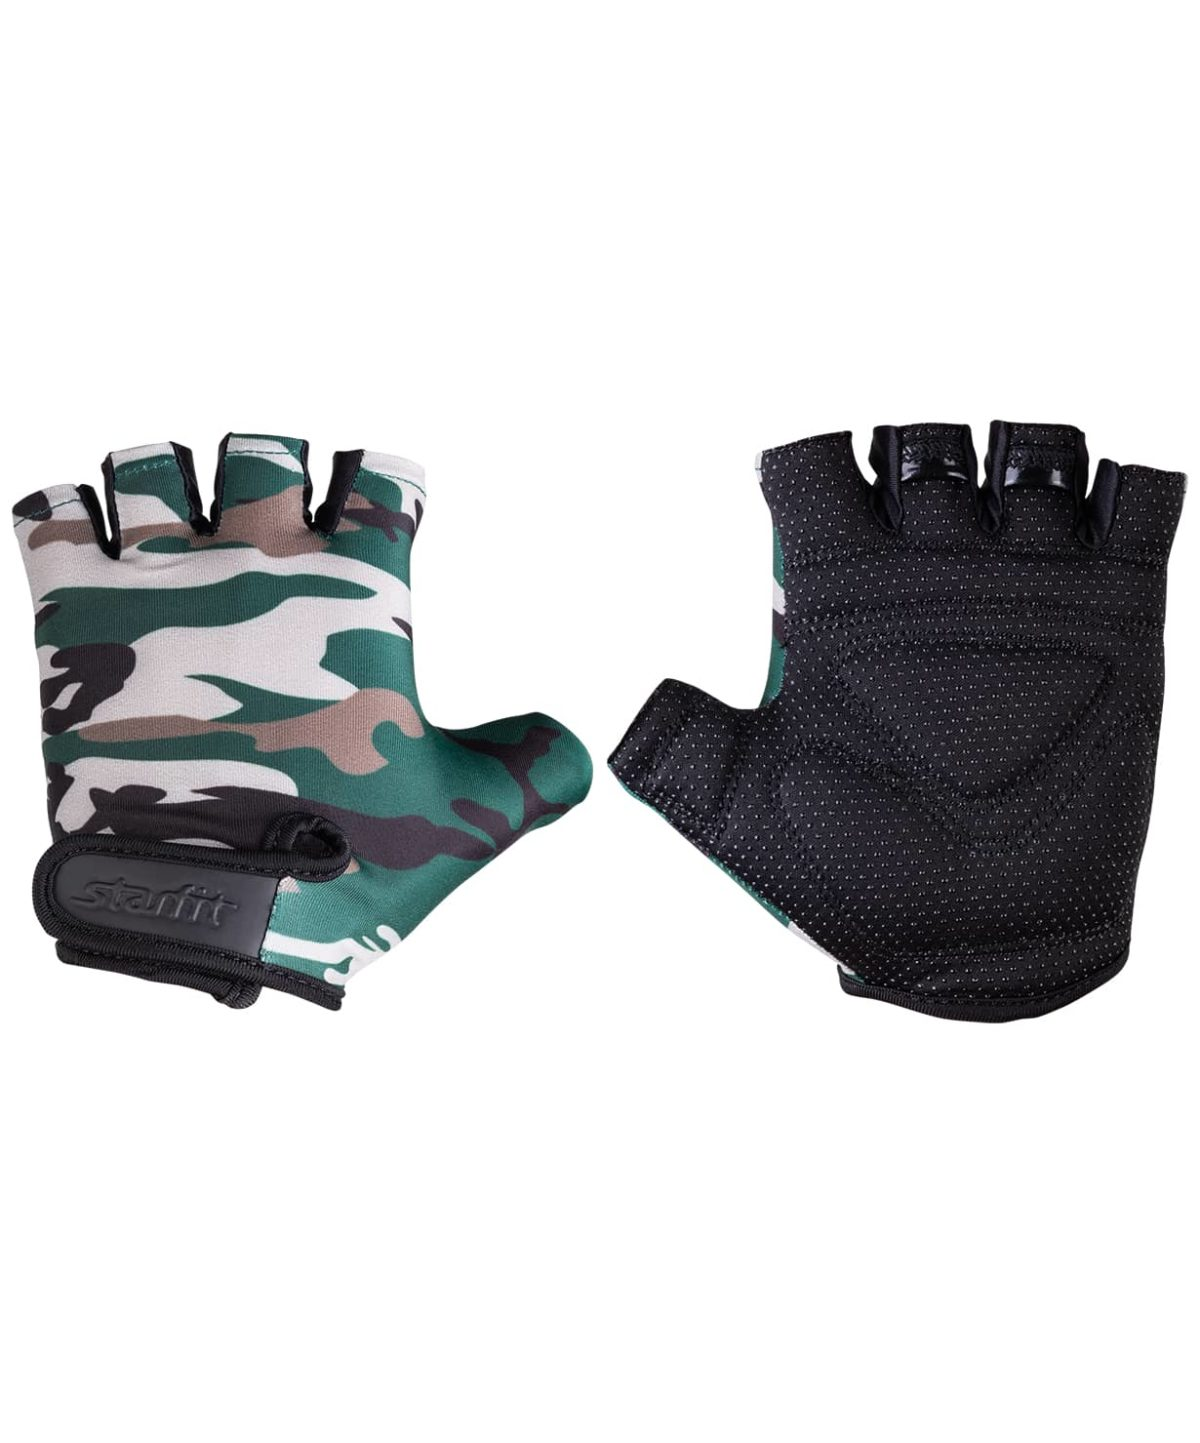 STARFIT перчатки д/фитнеса  SU-126: хаки - 1